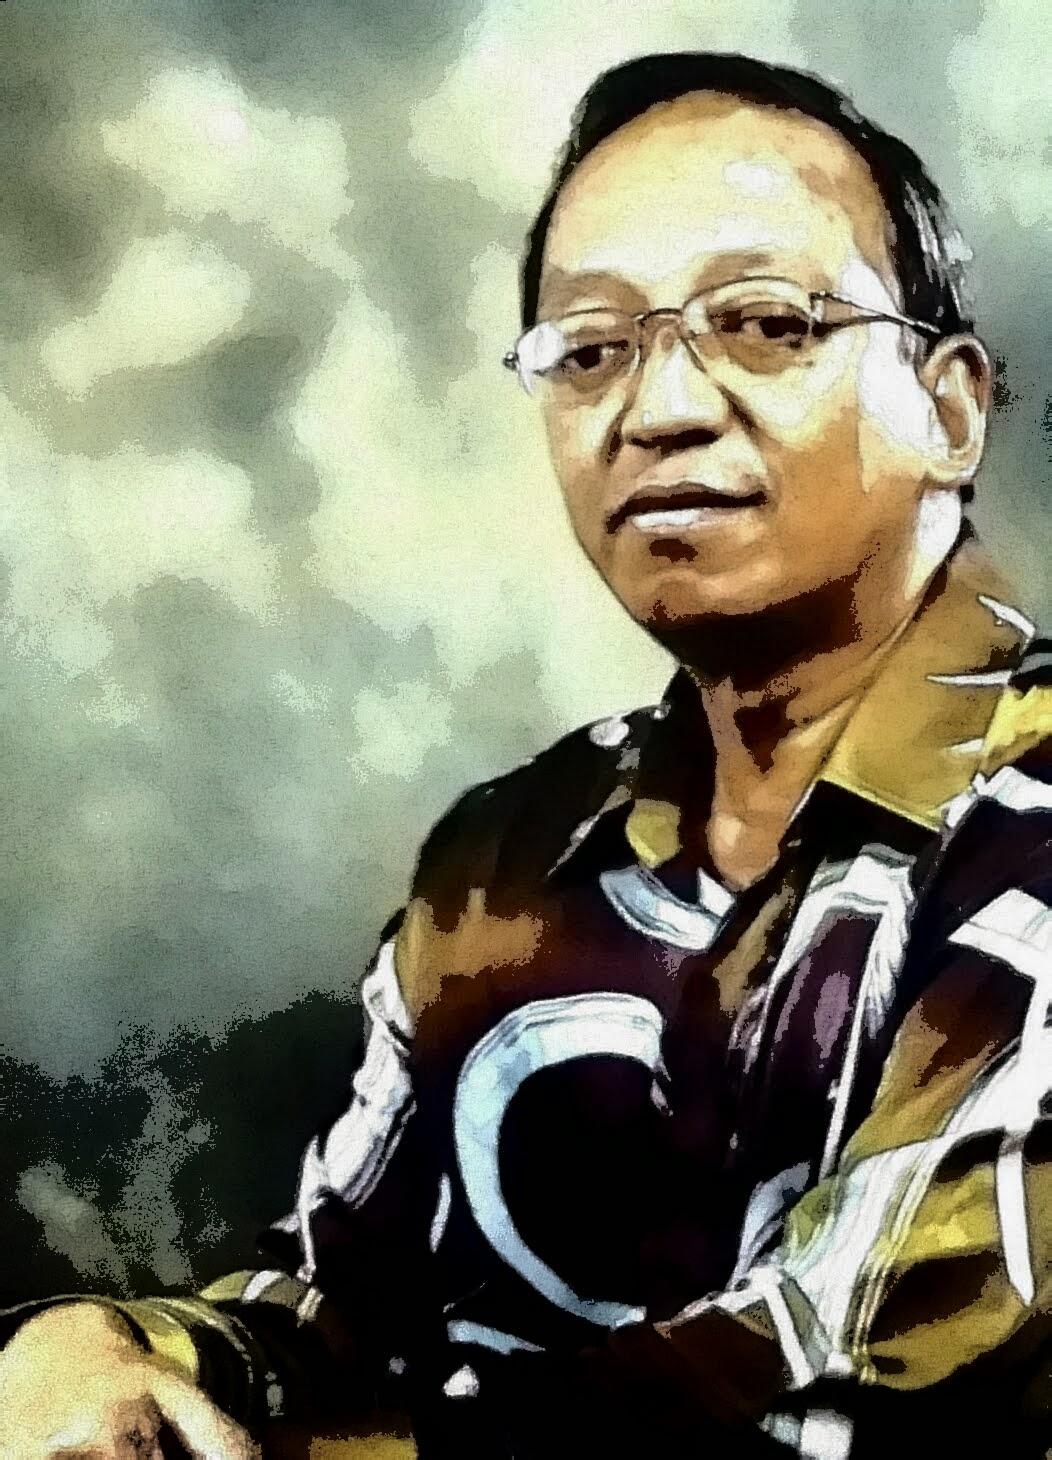 Dato' Hj. Bukhari b. Abdullah